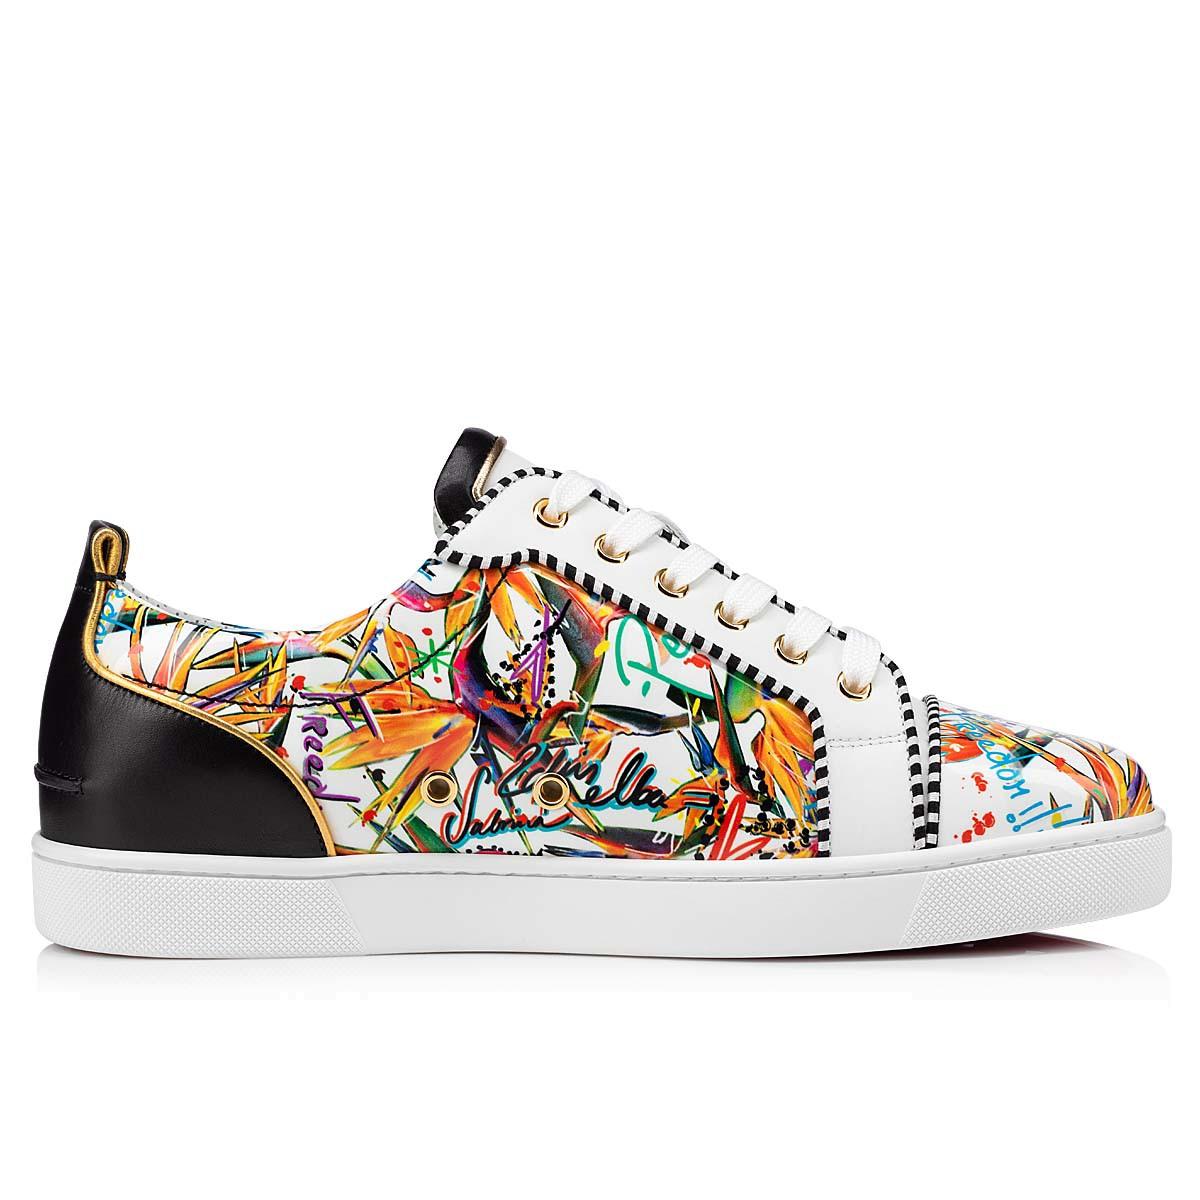 Shoes - Freelouis Junior Flat - Christian Louboutin